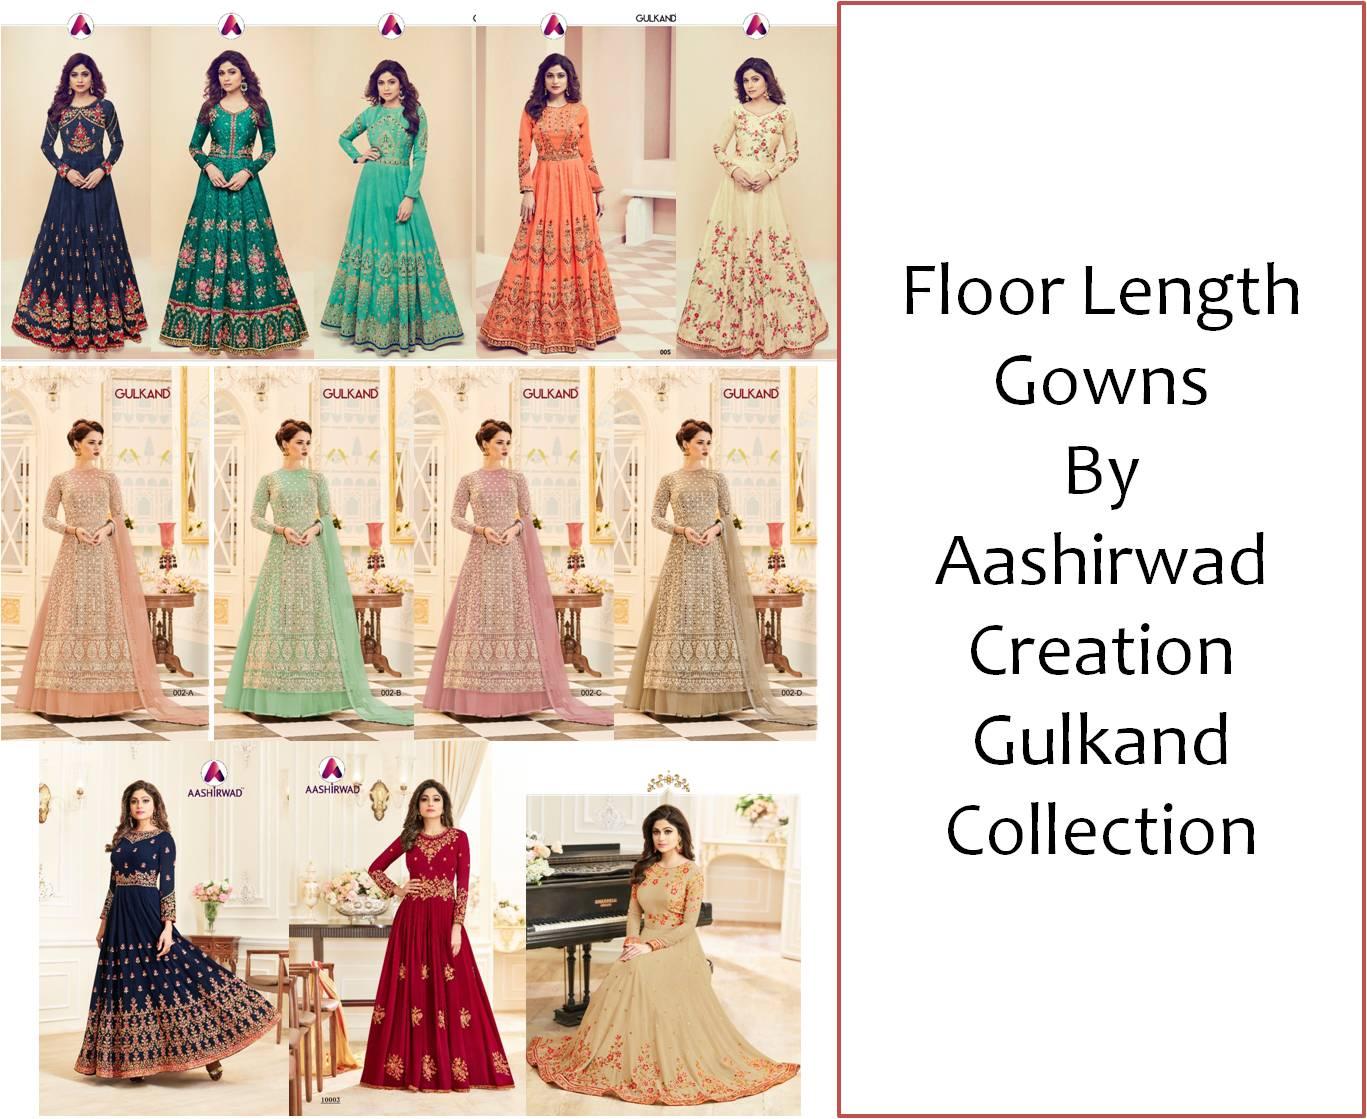 Shop Floor Length Gowns Aashirwad Gulkand Collection Online